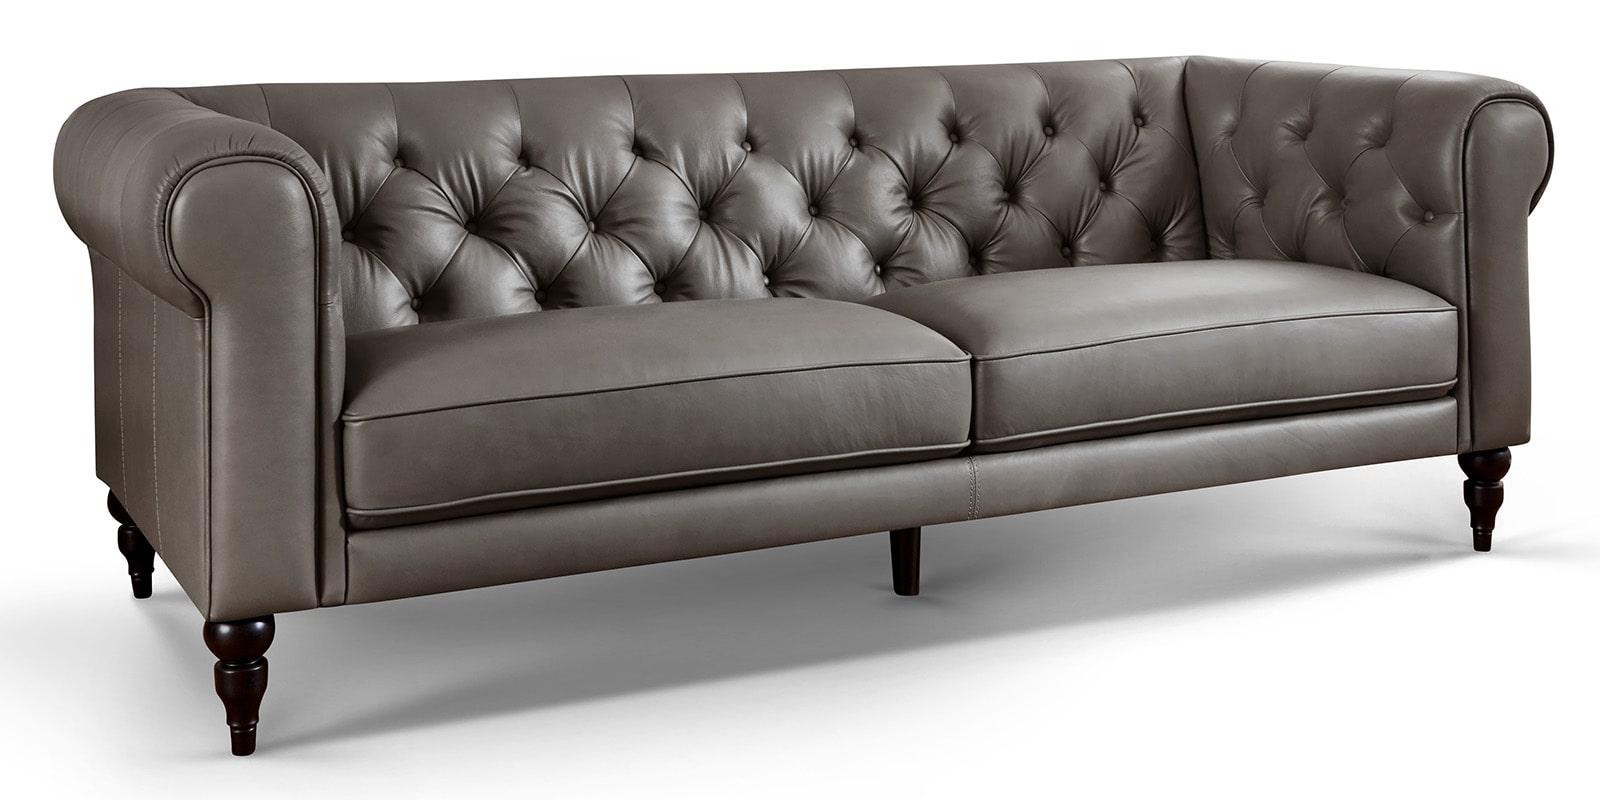 Full Size of Couch Grau 2 Und 3 Sitzer Sofa Leder Ikea Samt Retro Kingsley 3 Sitzer Nino Schwarz/grau Chesterfield Ledersofa Hudson Erpo Kunstleder Mit Hocker Riess Sofa Sofa 3 Sitzer Grau